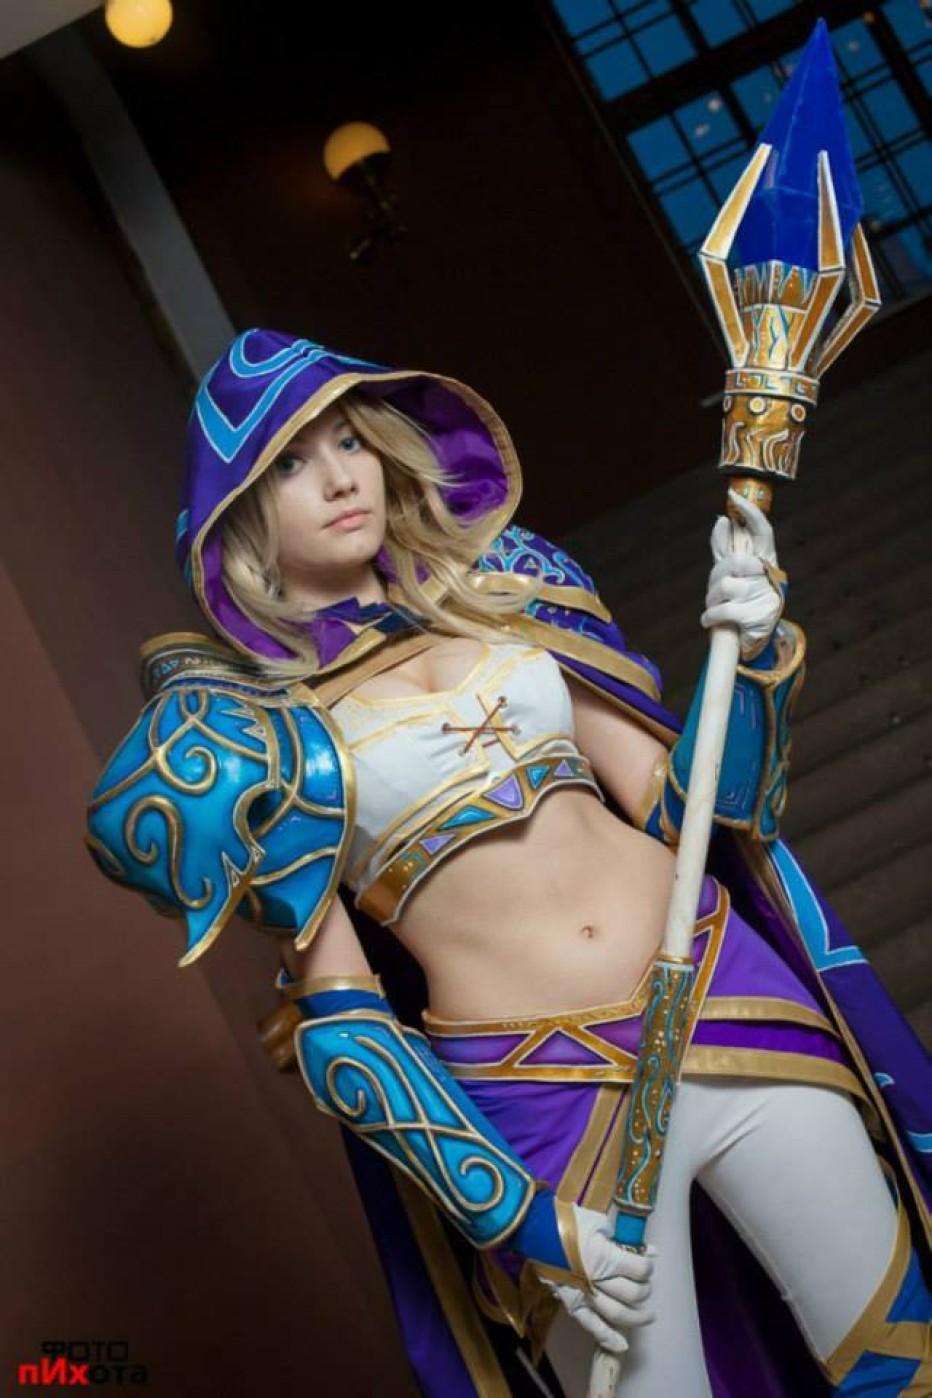 Warcraft-III-Jaina-Proudmoore-Narga-Cosplay-Gamers-Heroes-8.jpg